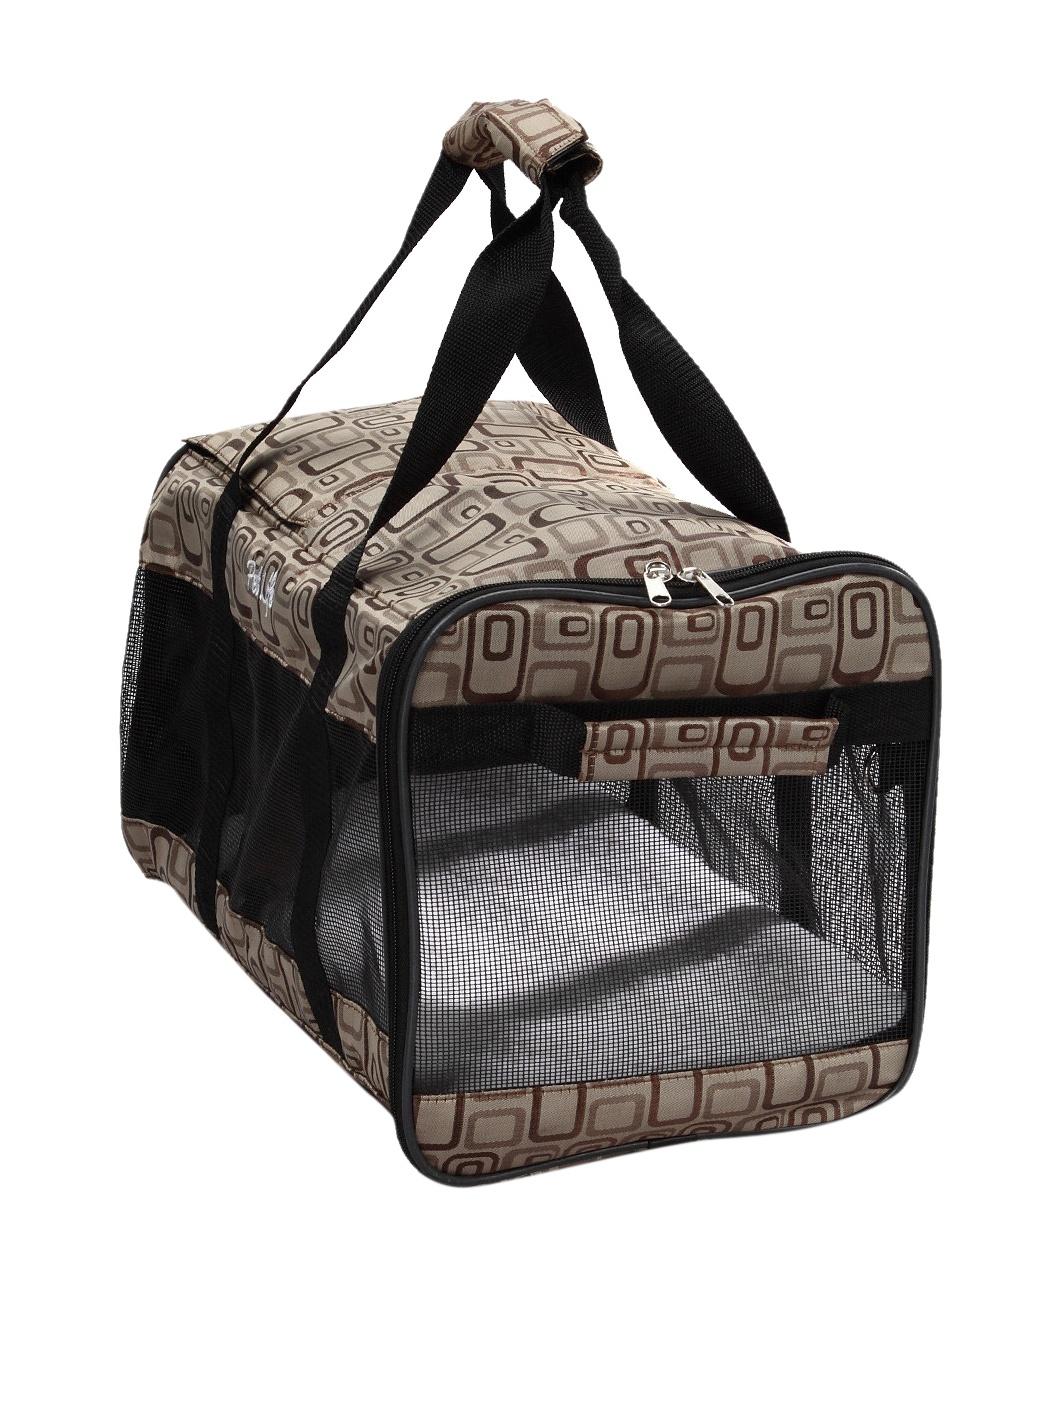 Pet Life Zippered Sporty Mesh Carrier (Jacquard)